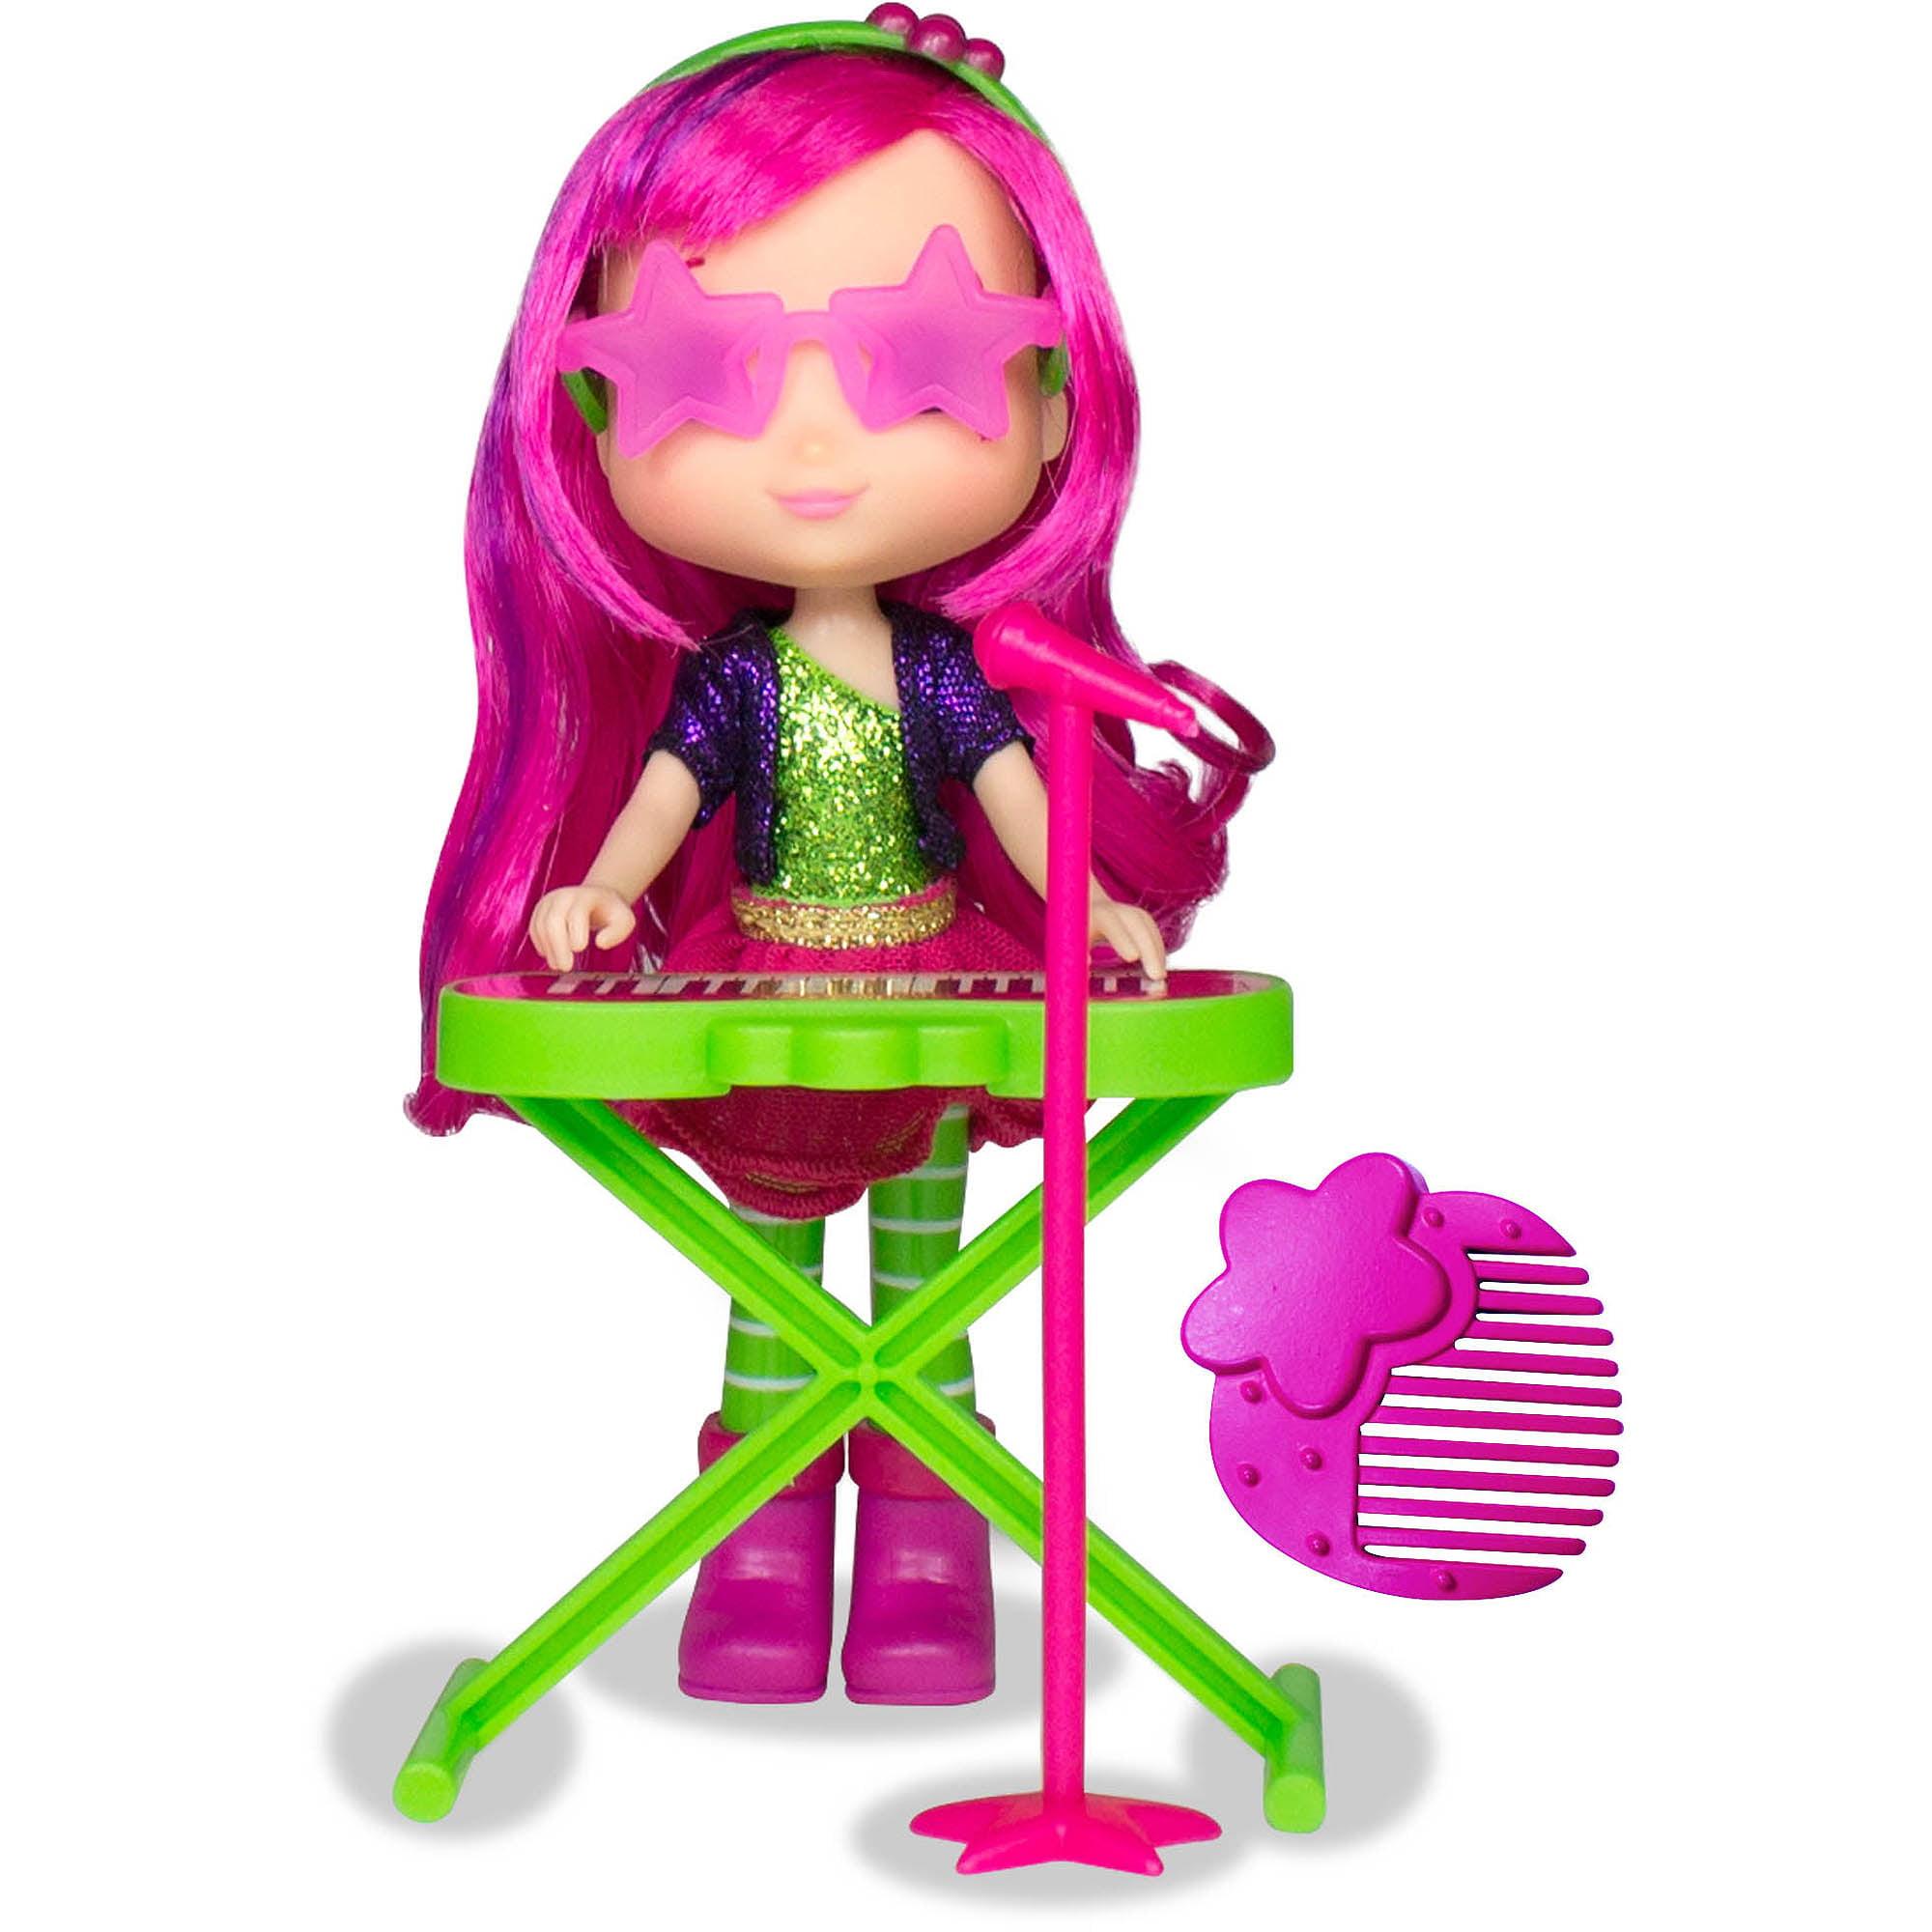 Raspberry Torte Doll with Keyboard